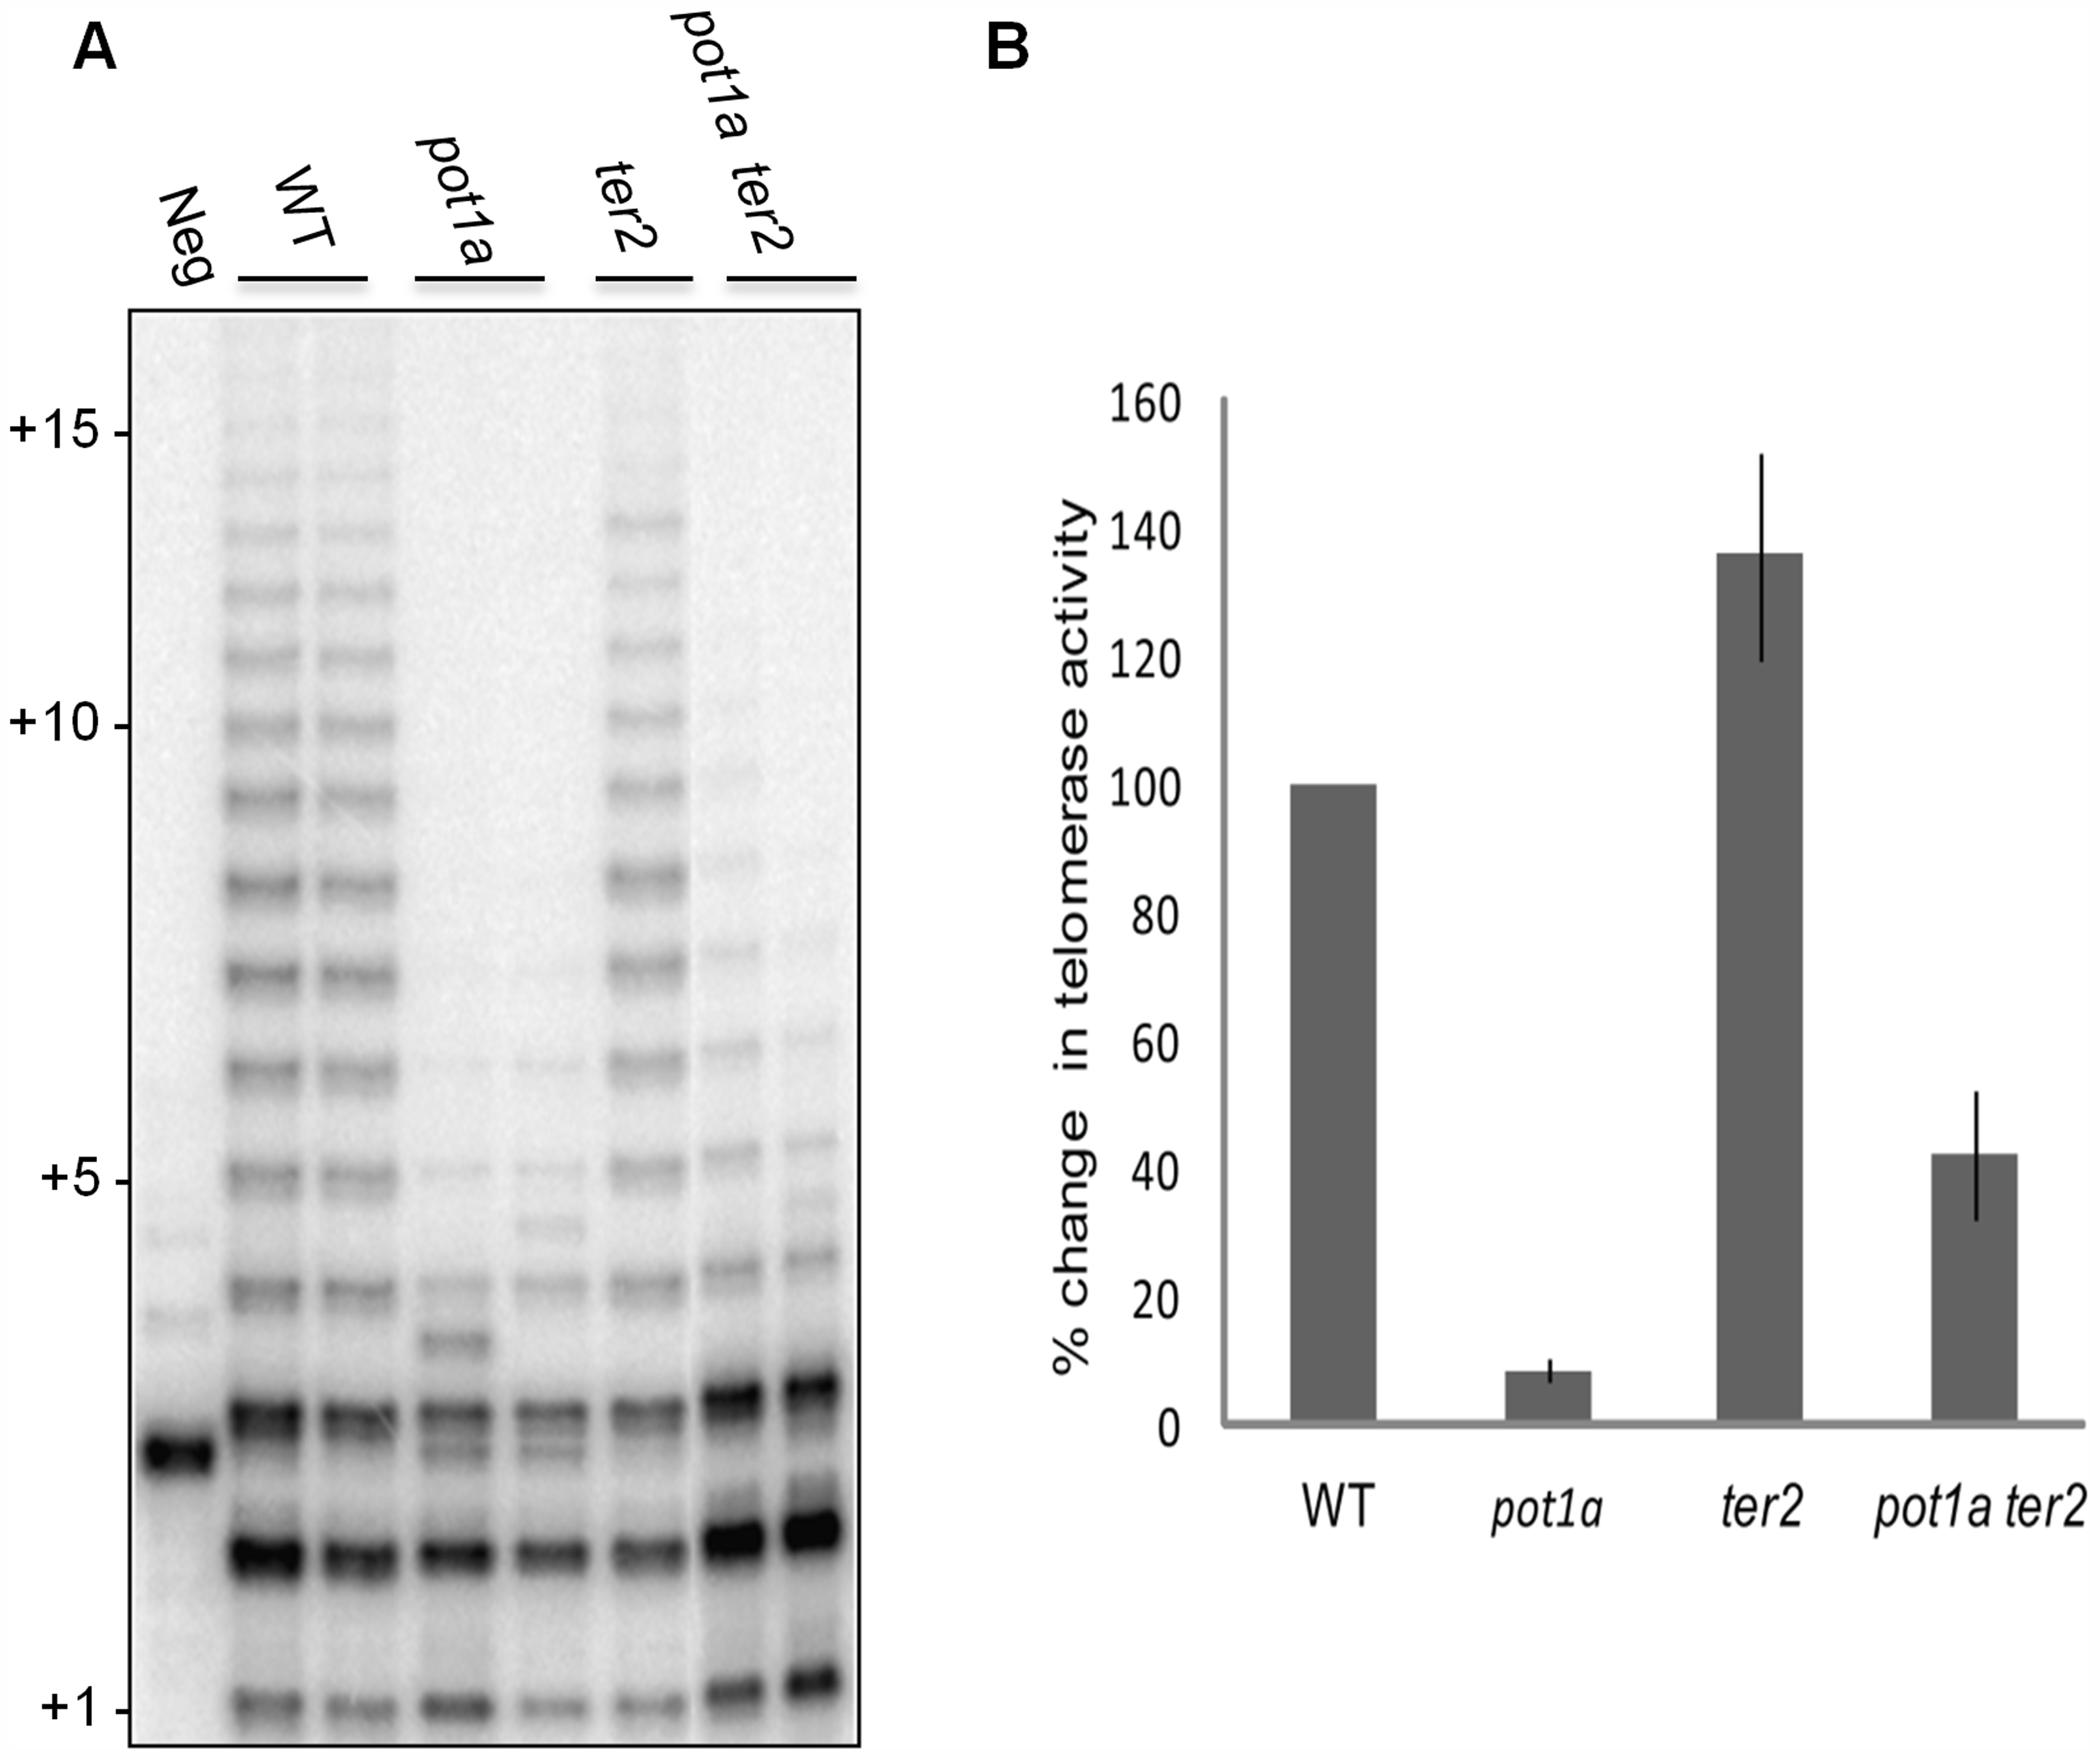 POT1a stimulates telomerase activity of the TER1 RNP.